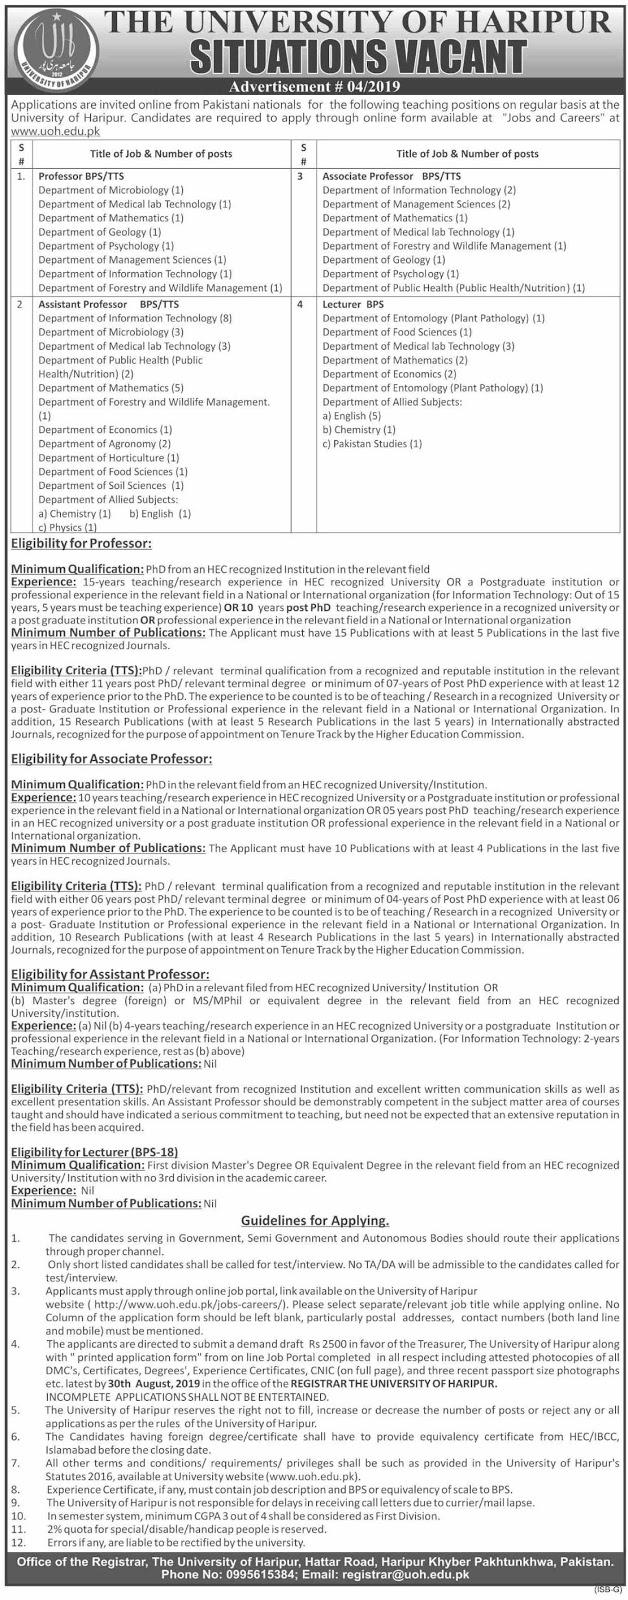 Advertisement for the University of Haripur Jobs